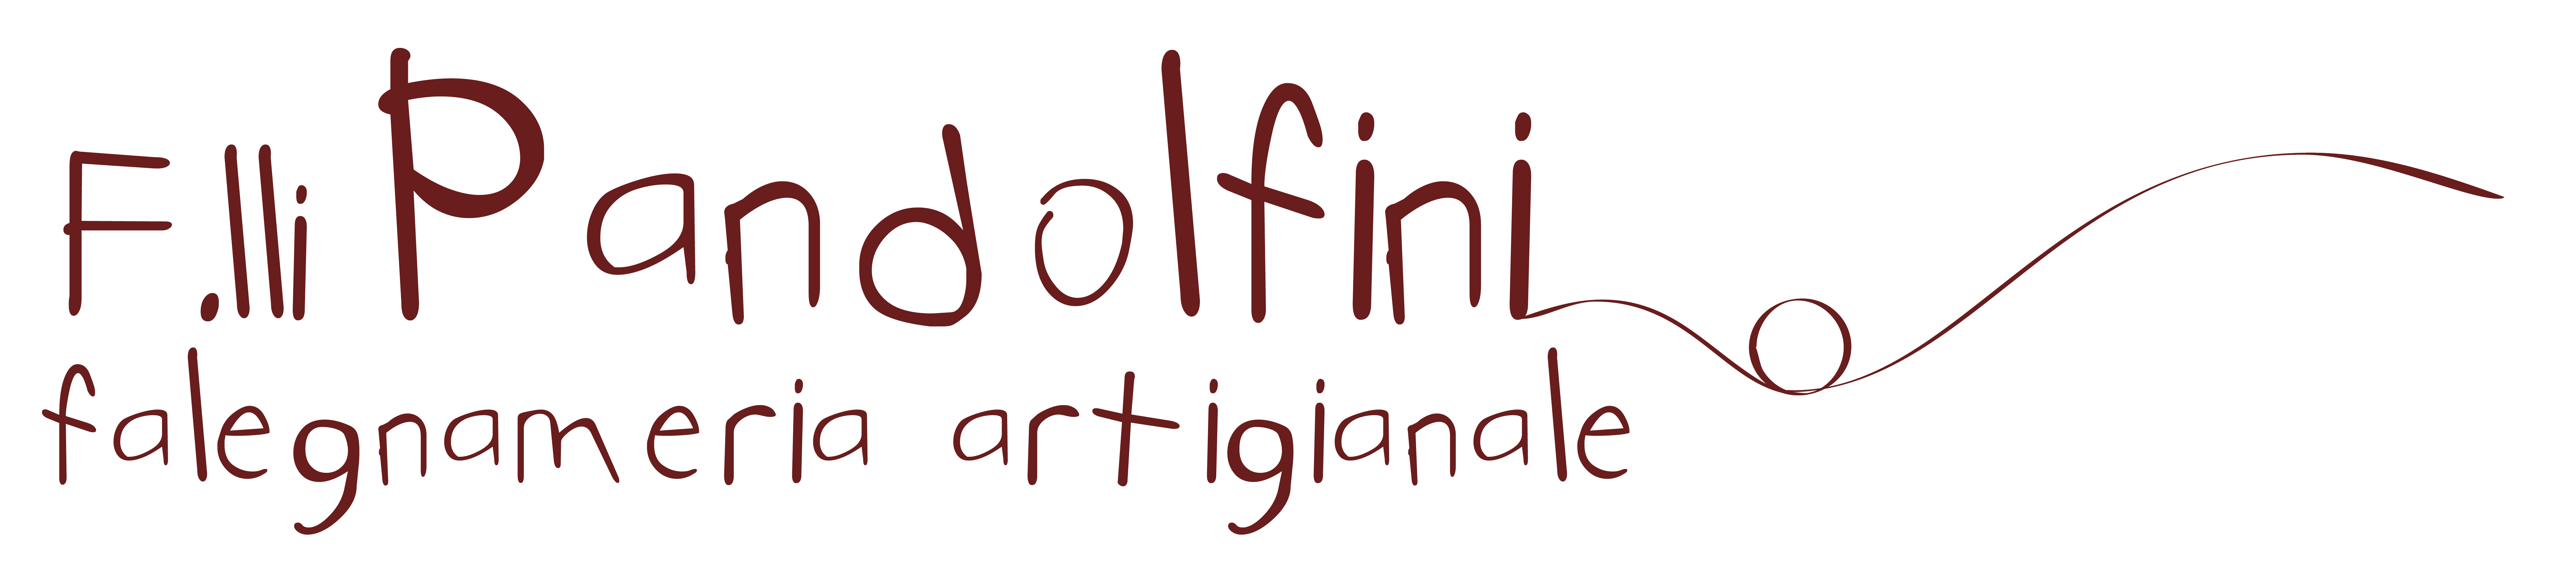 Fratelli Pandolfini | Soppalchi - Cucine - Camere - Mobili su misura Firenze